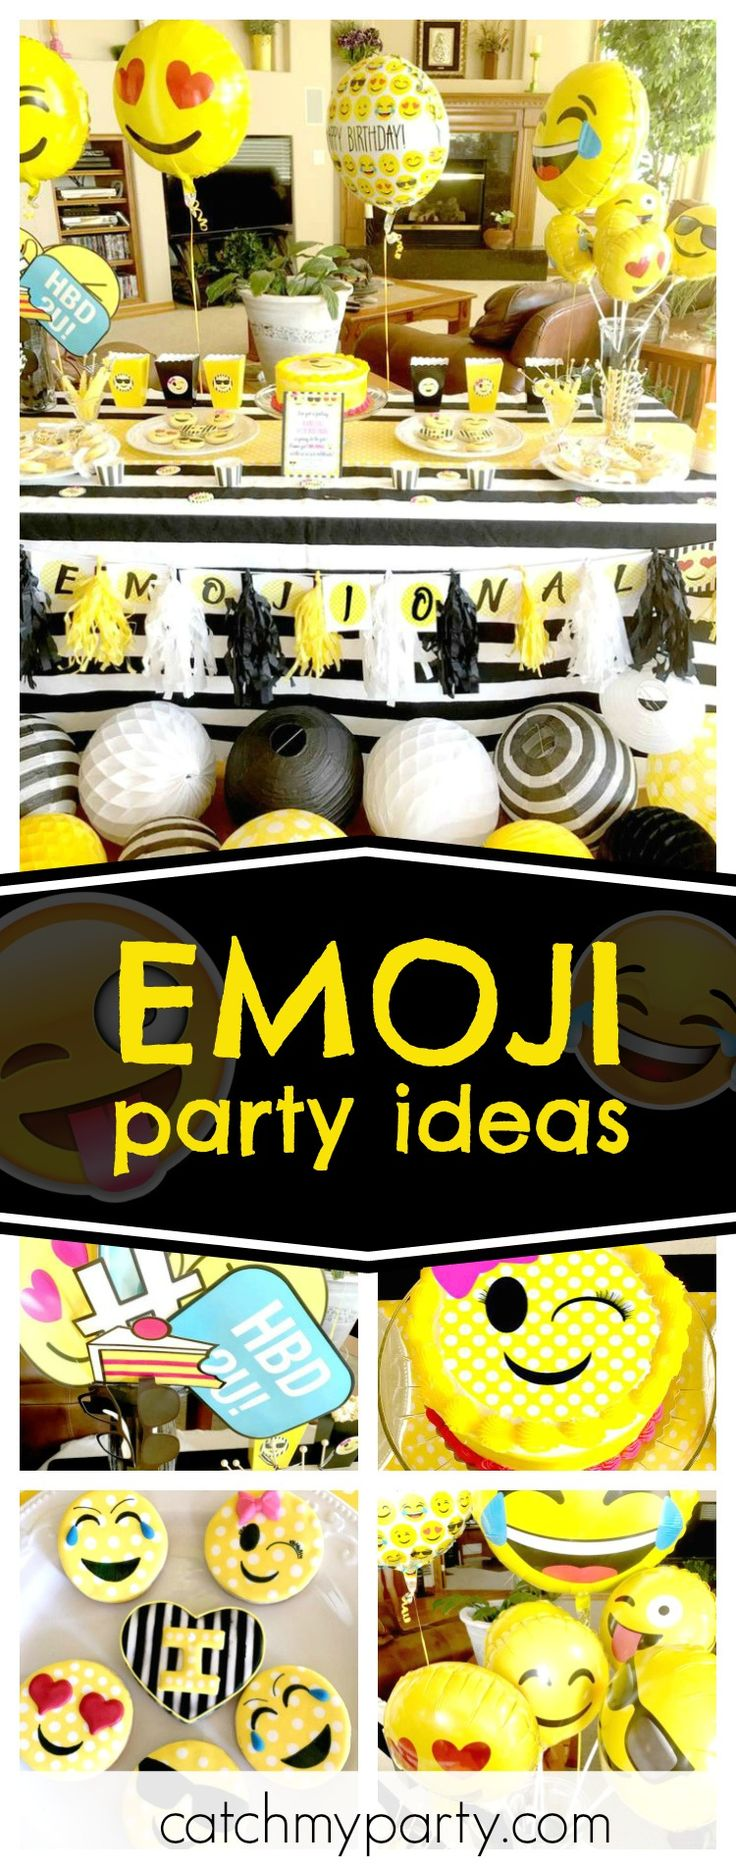 how to make a poop emoji cake